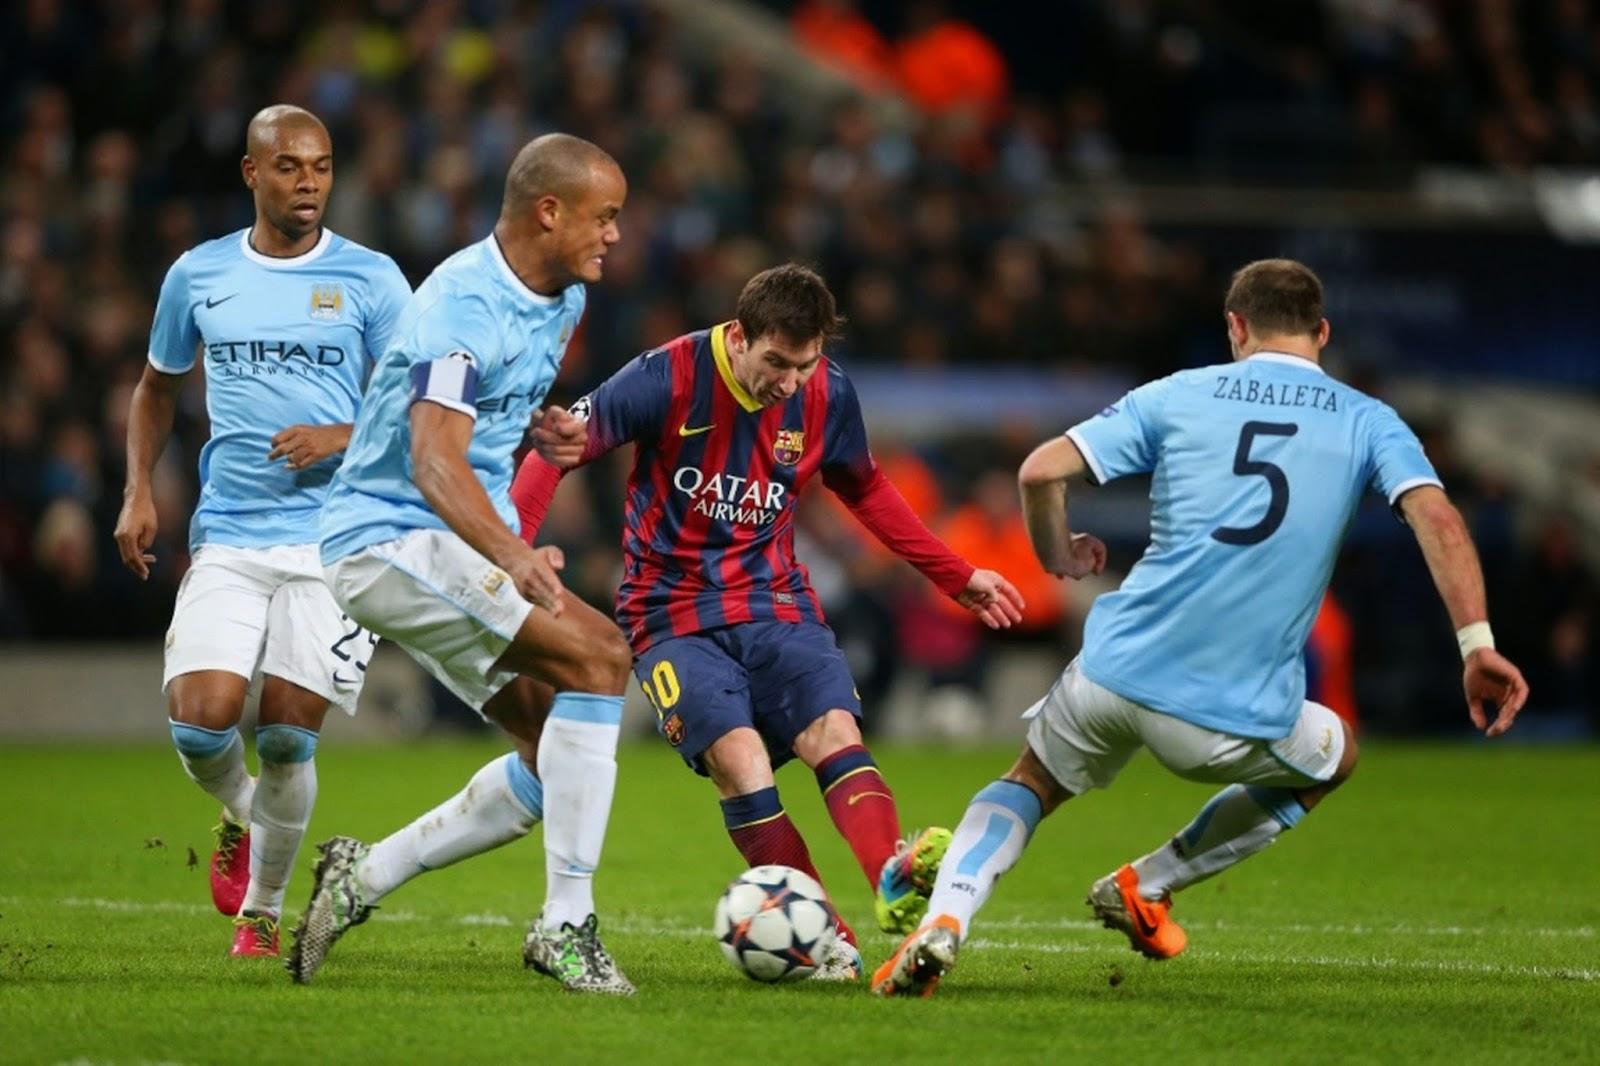 Yaya, Nasri, Dzeko, Others To Be Sold If Man City Lose Against Barca Tonight